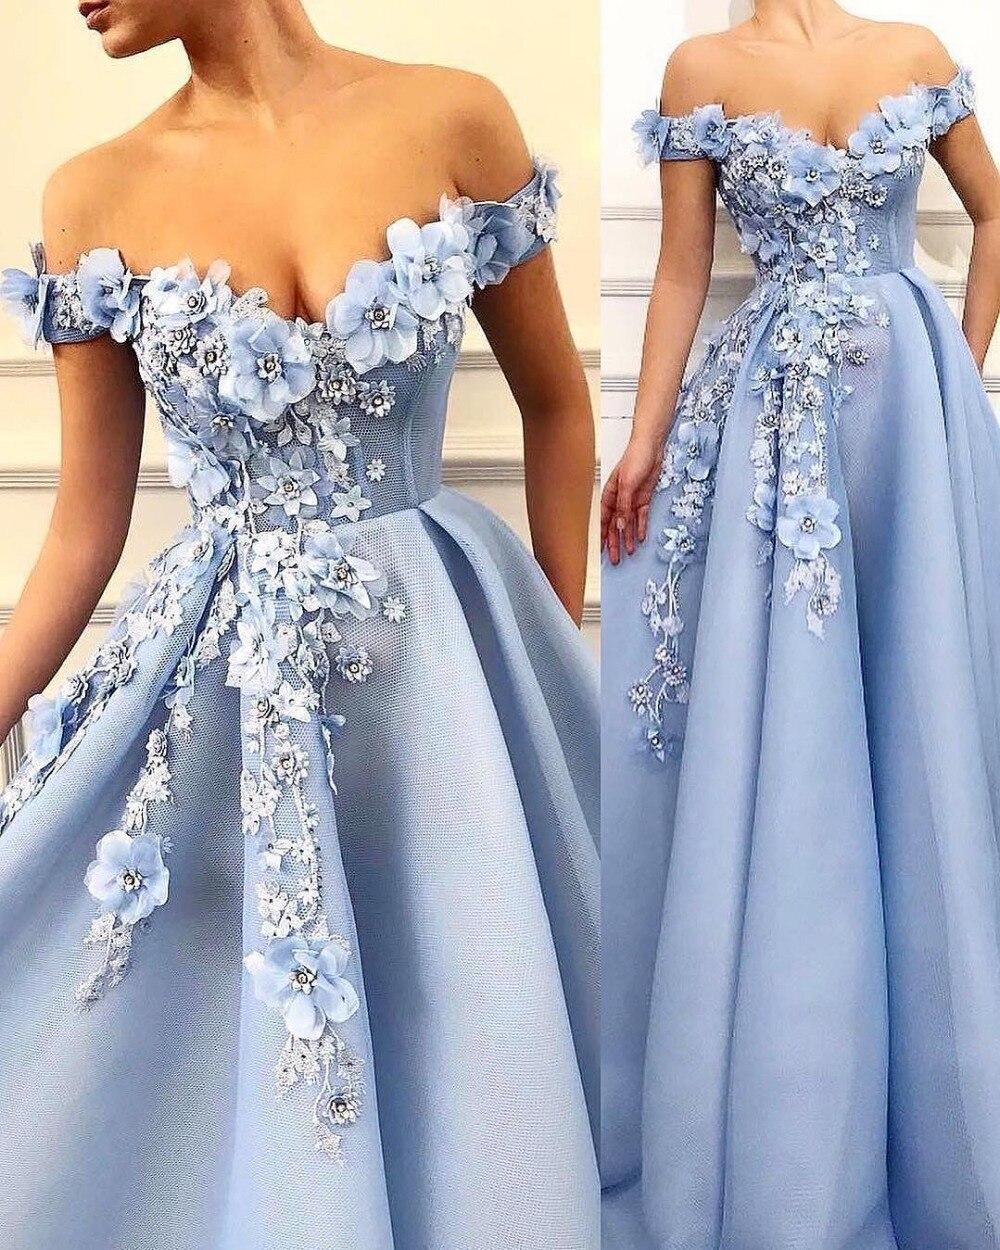 Vestidos Sky Blue Long Evening Dresses 2019 Off The Shoulder 3D Flower Appliques Floor Length Formal Party Gowns Evening Dress